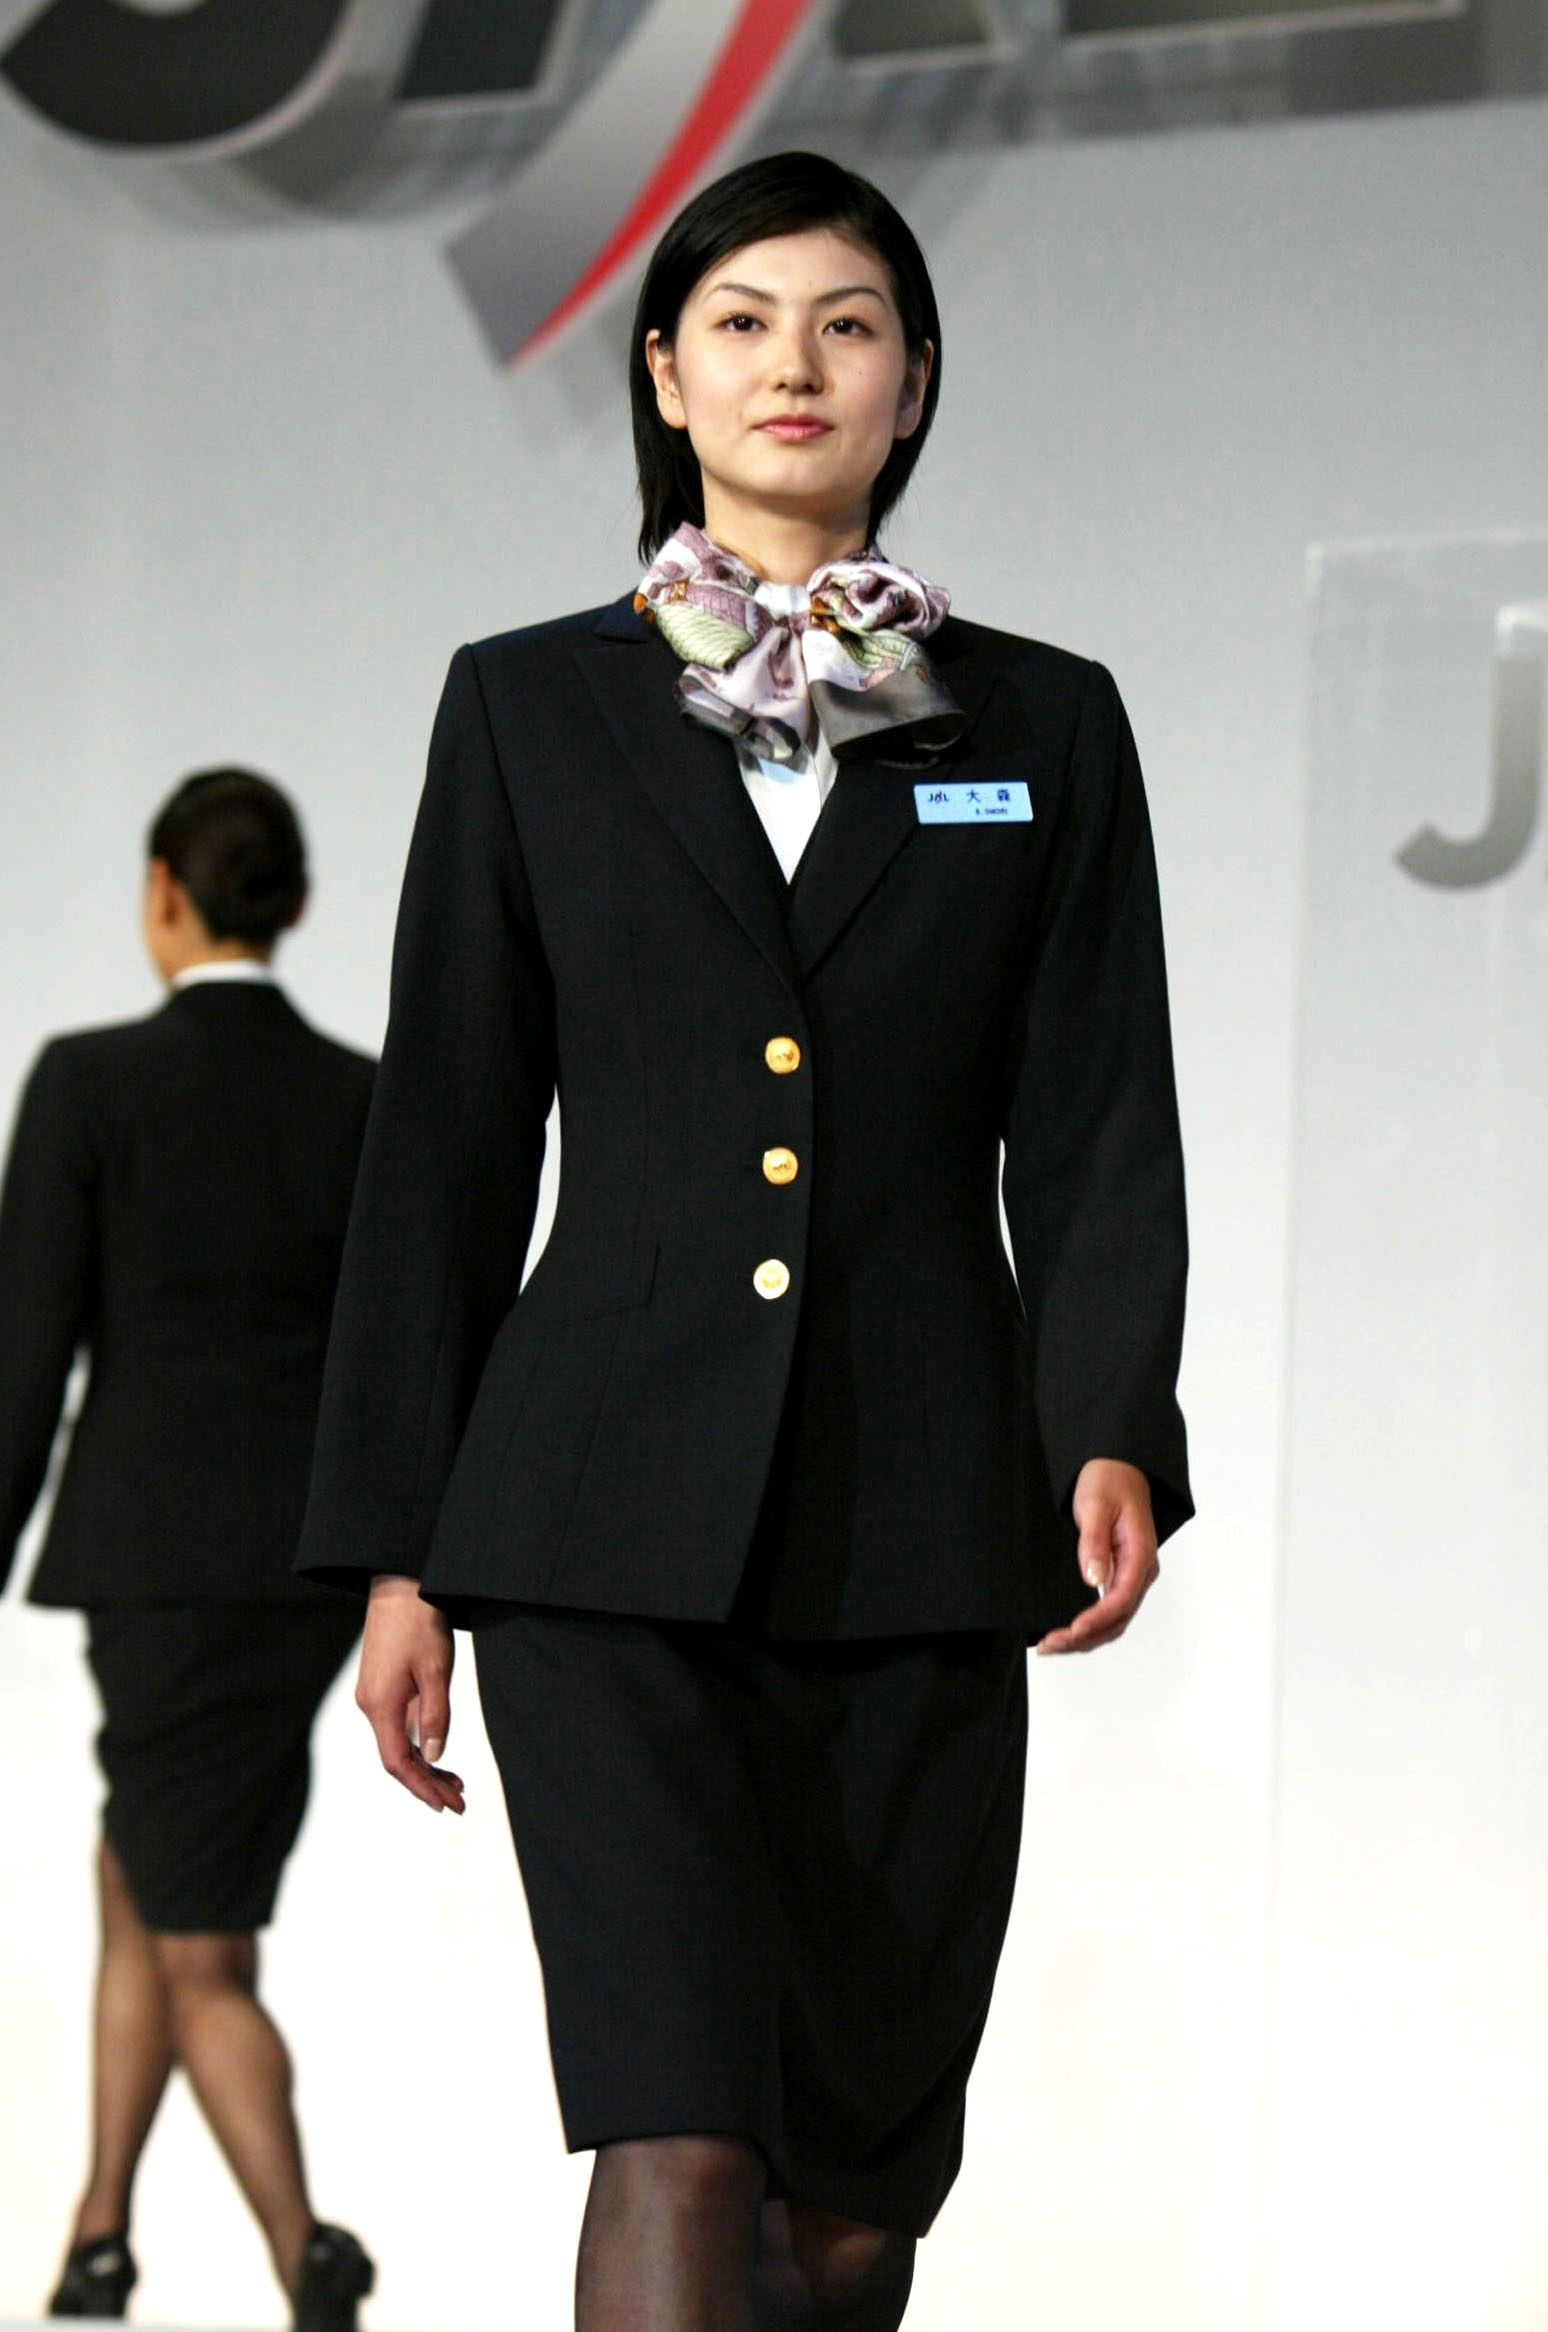 Japan Airlines / Stewardes